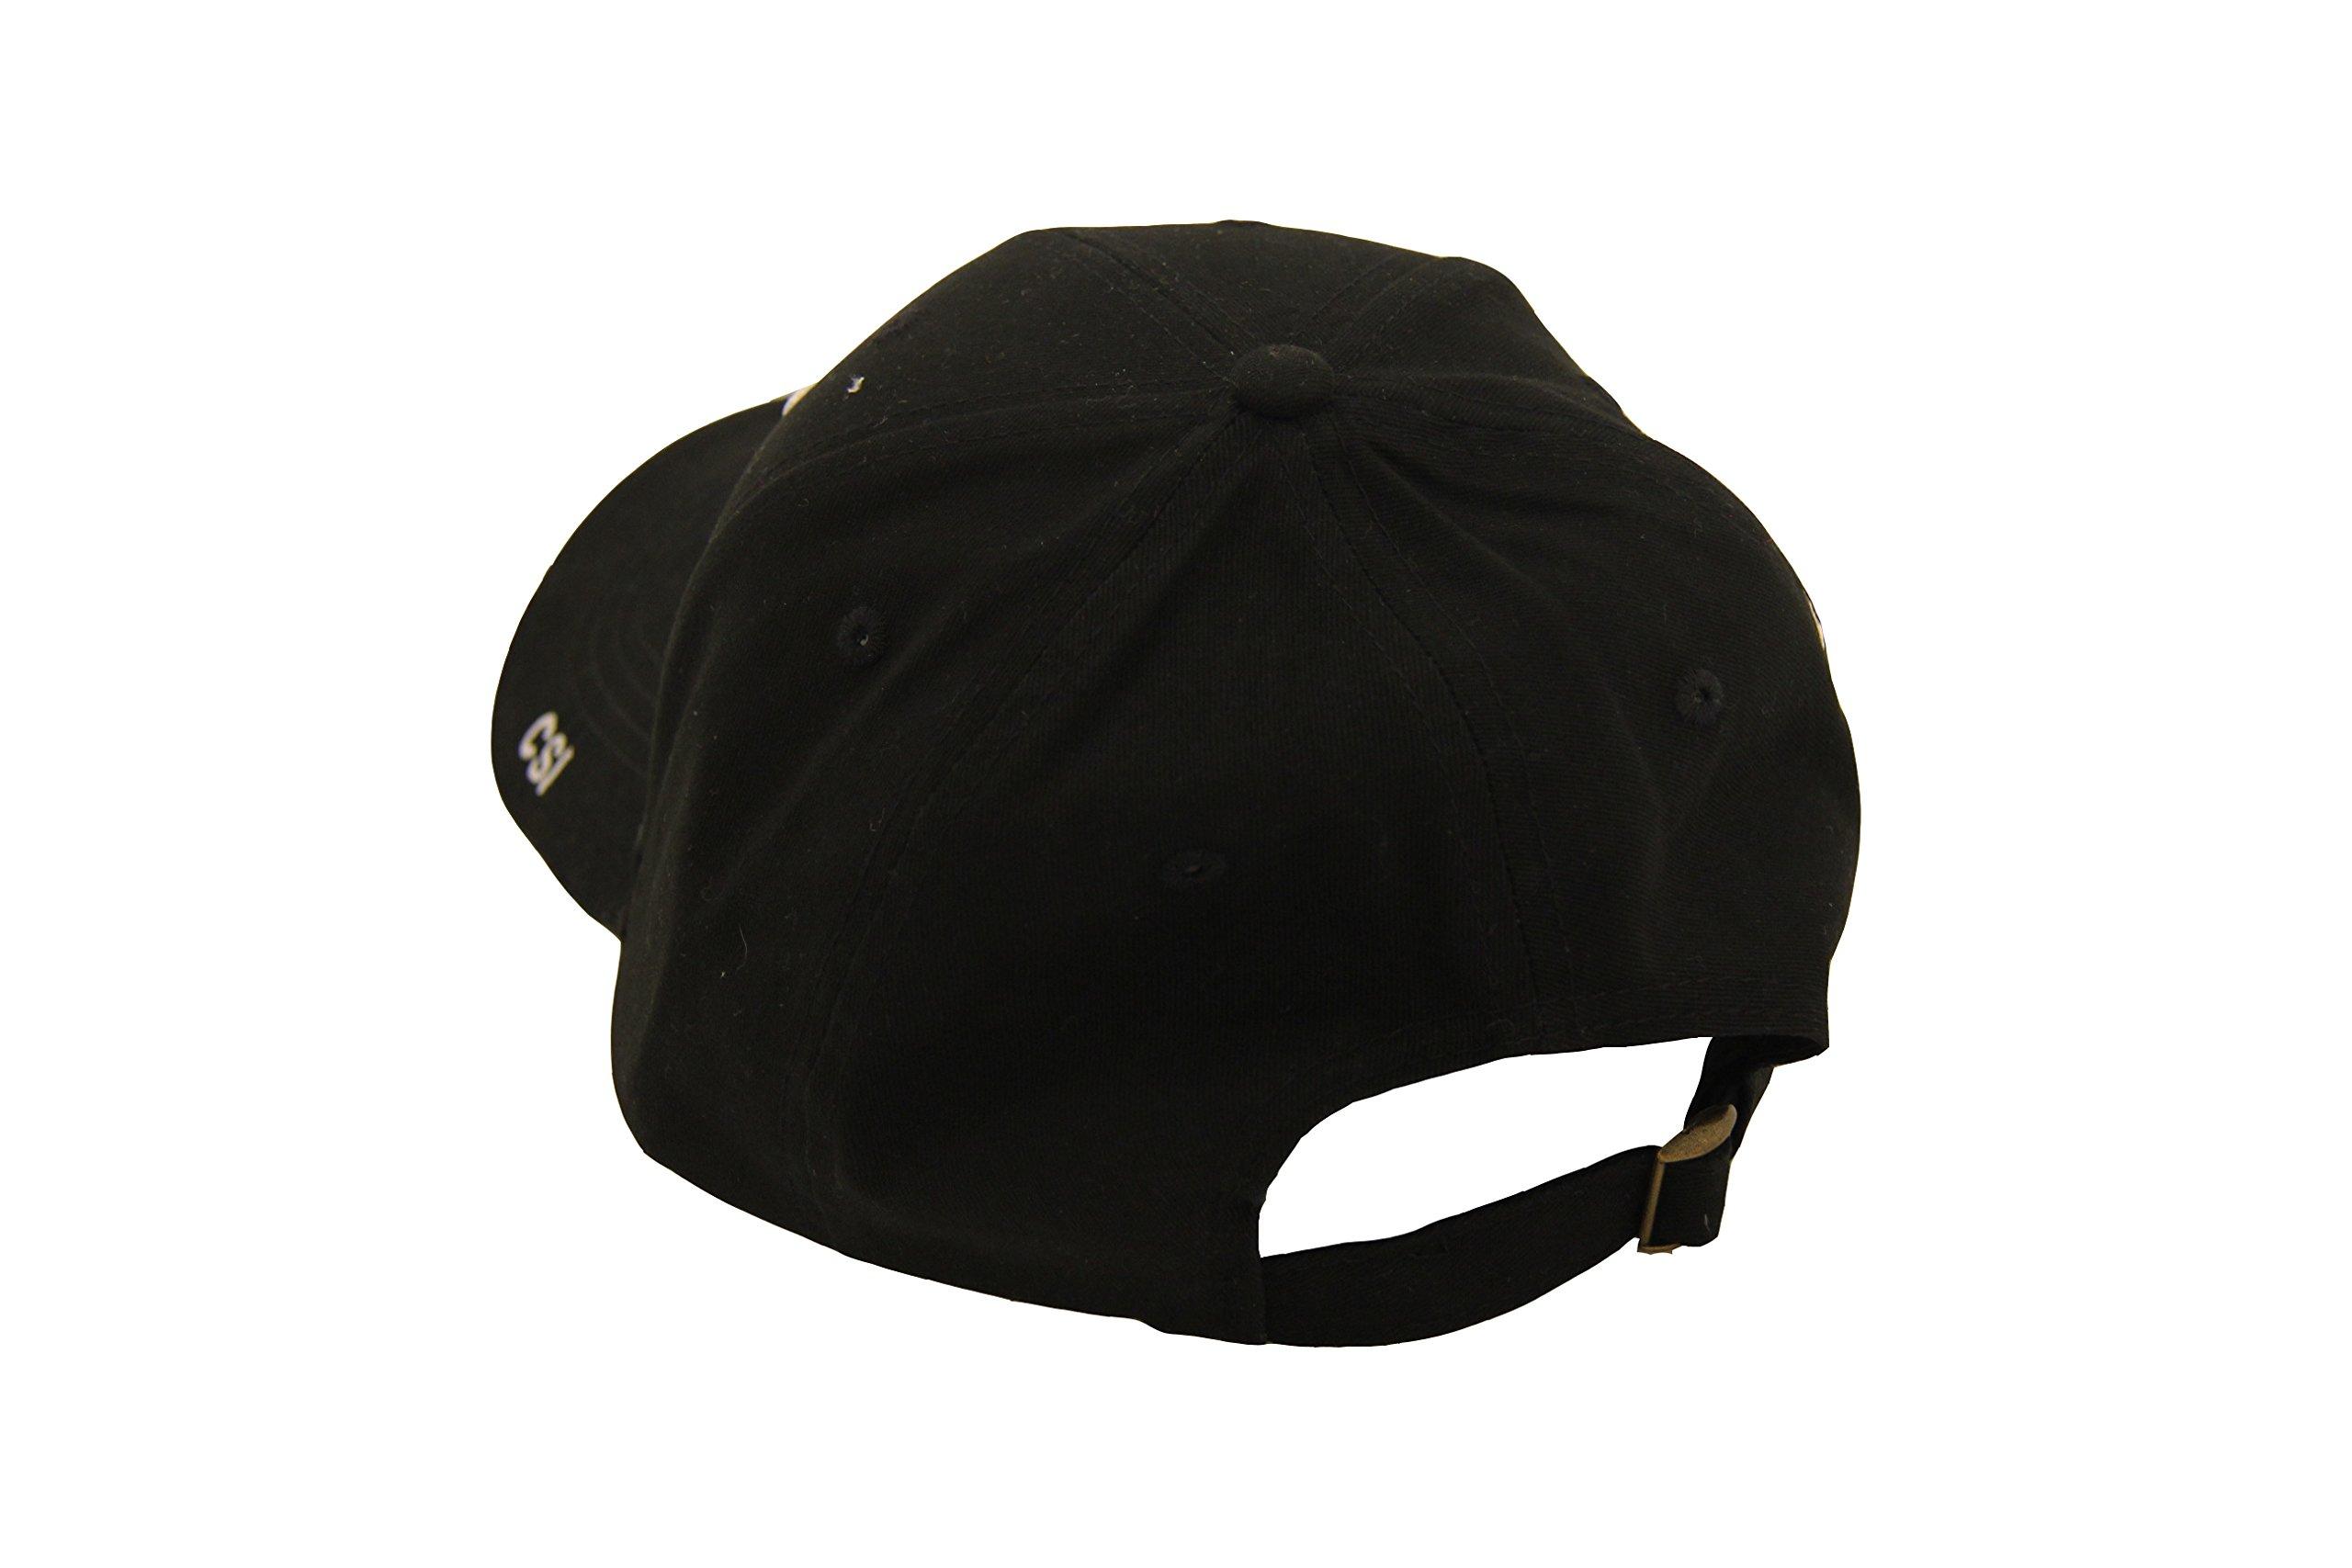 CSI Crime Scene Investigation Logo Adult Strapback Hat by CSI (Image #2)